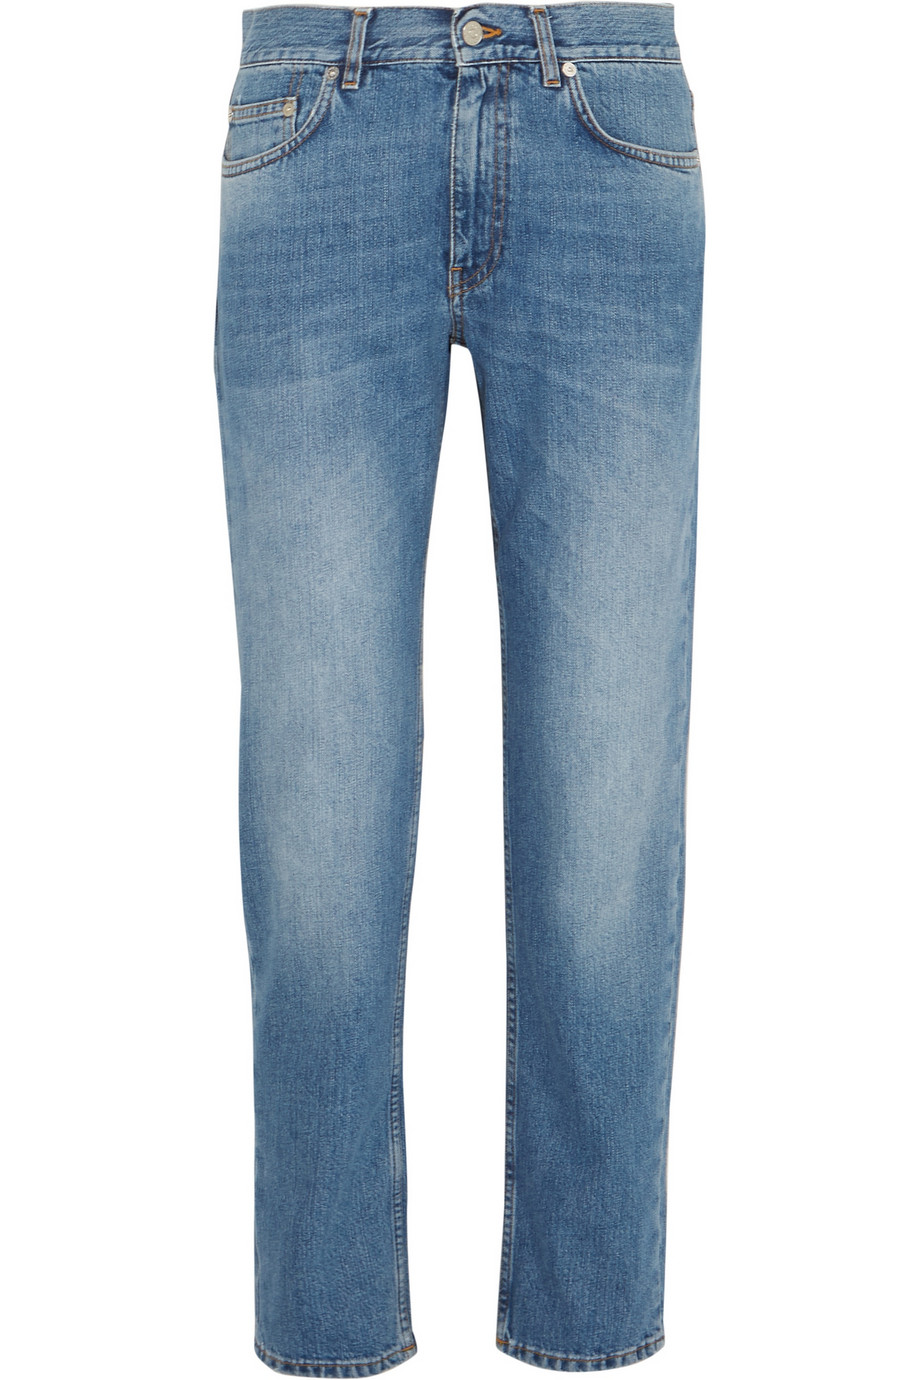 acne jeans boy friend jeans